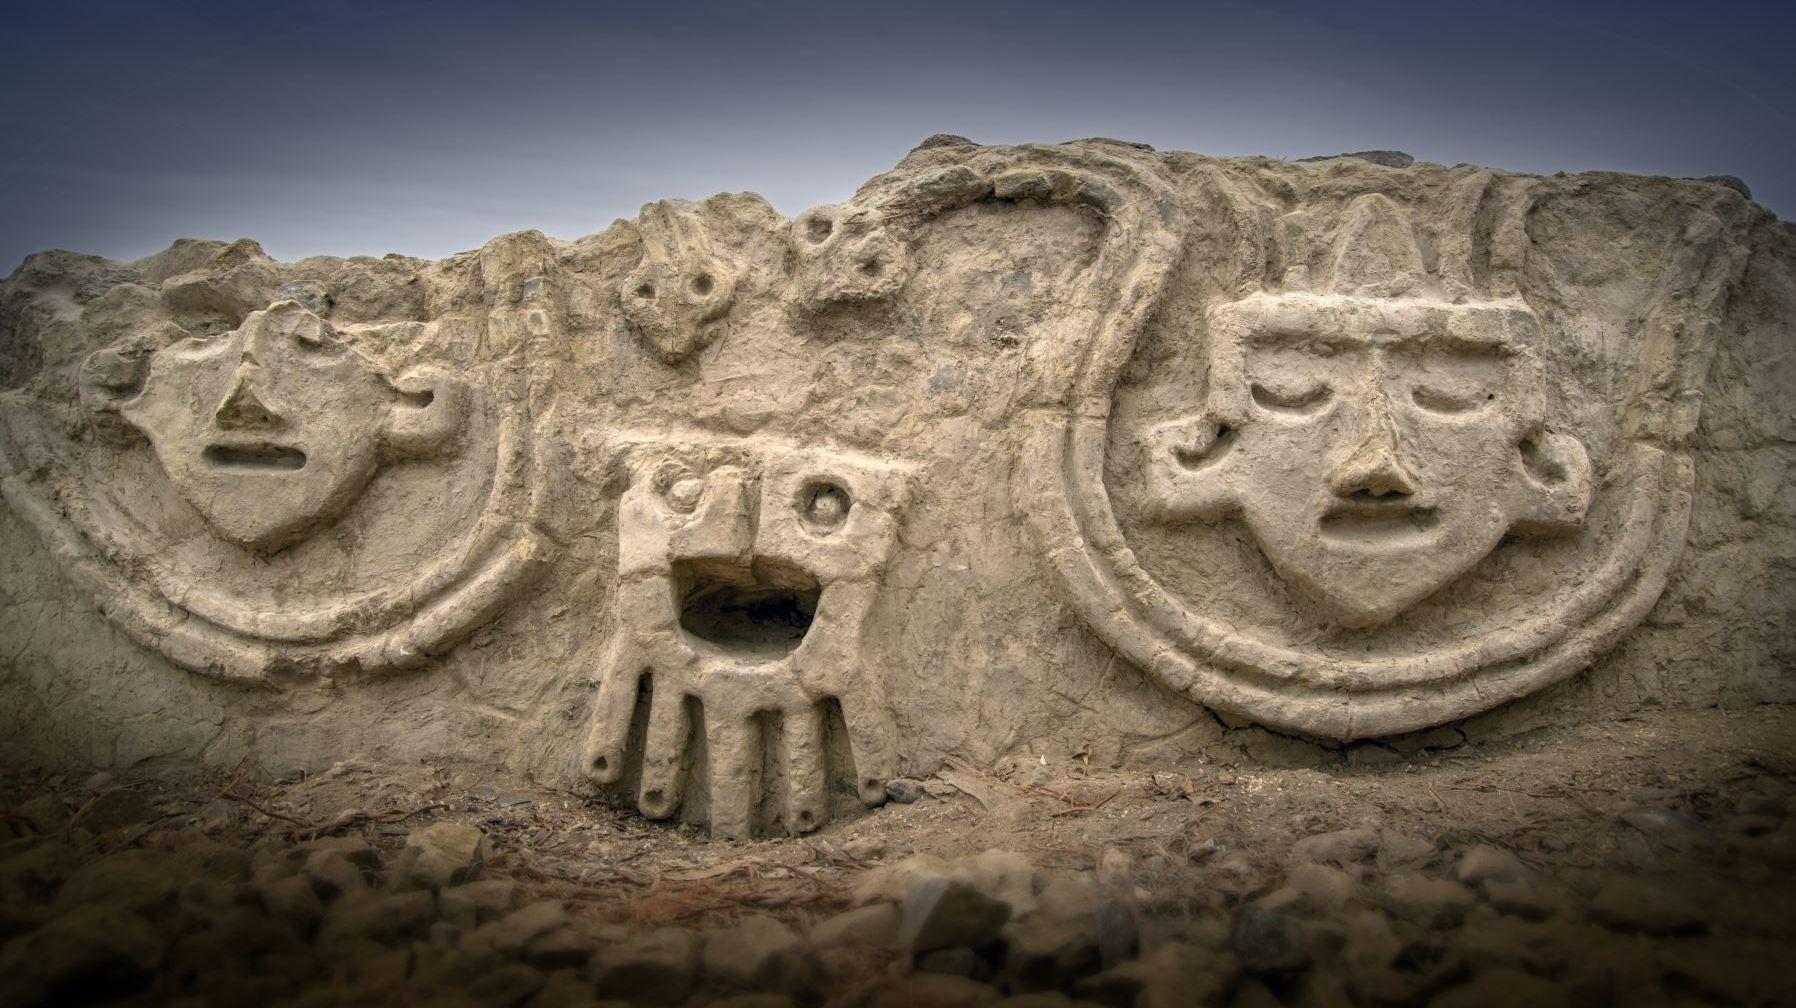 These3800-Year-Old Peruvian Carvings Look Like Modern Emoji